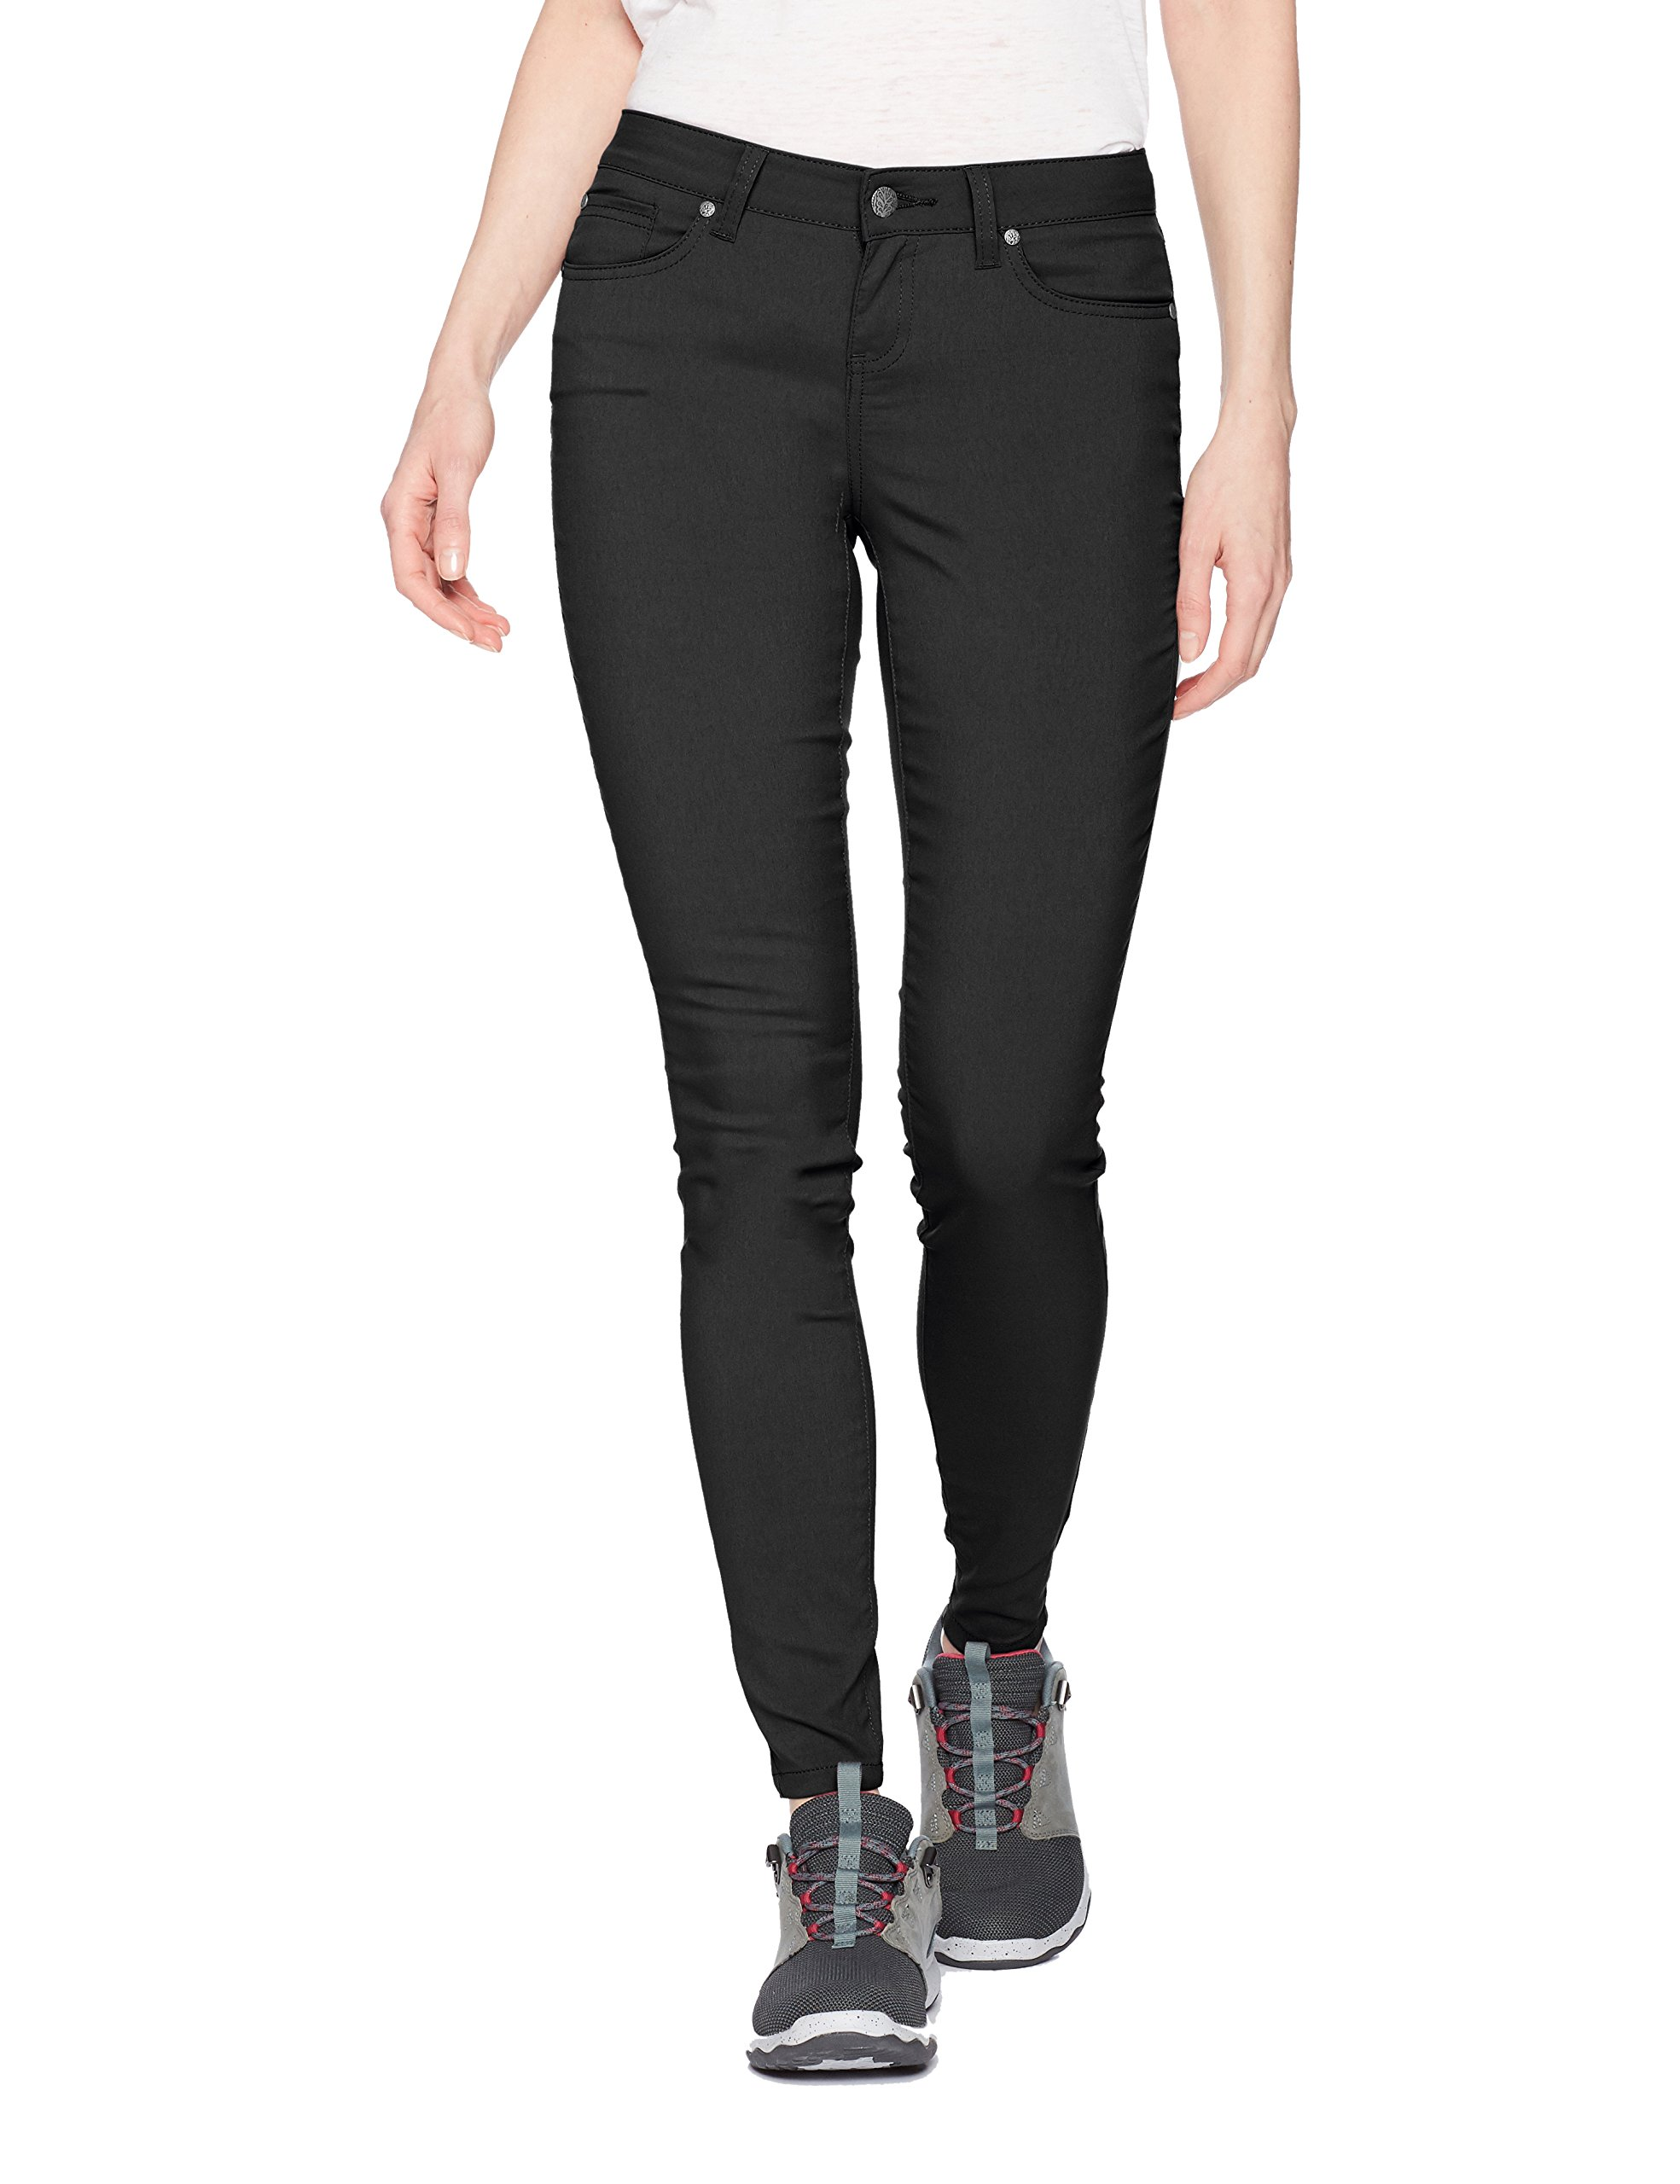 prAna Women's Briann Pant - Regular Inseam, Black, 12